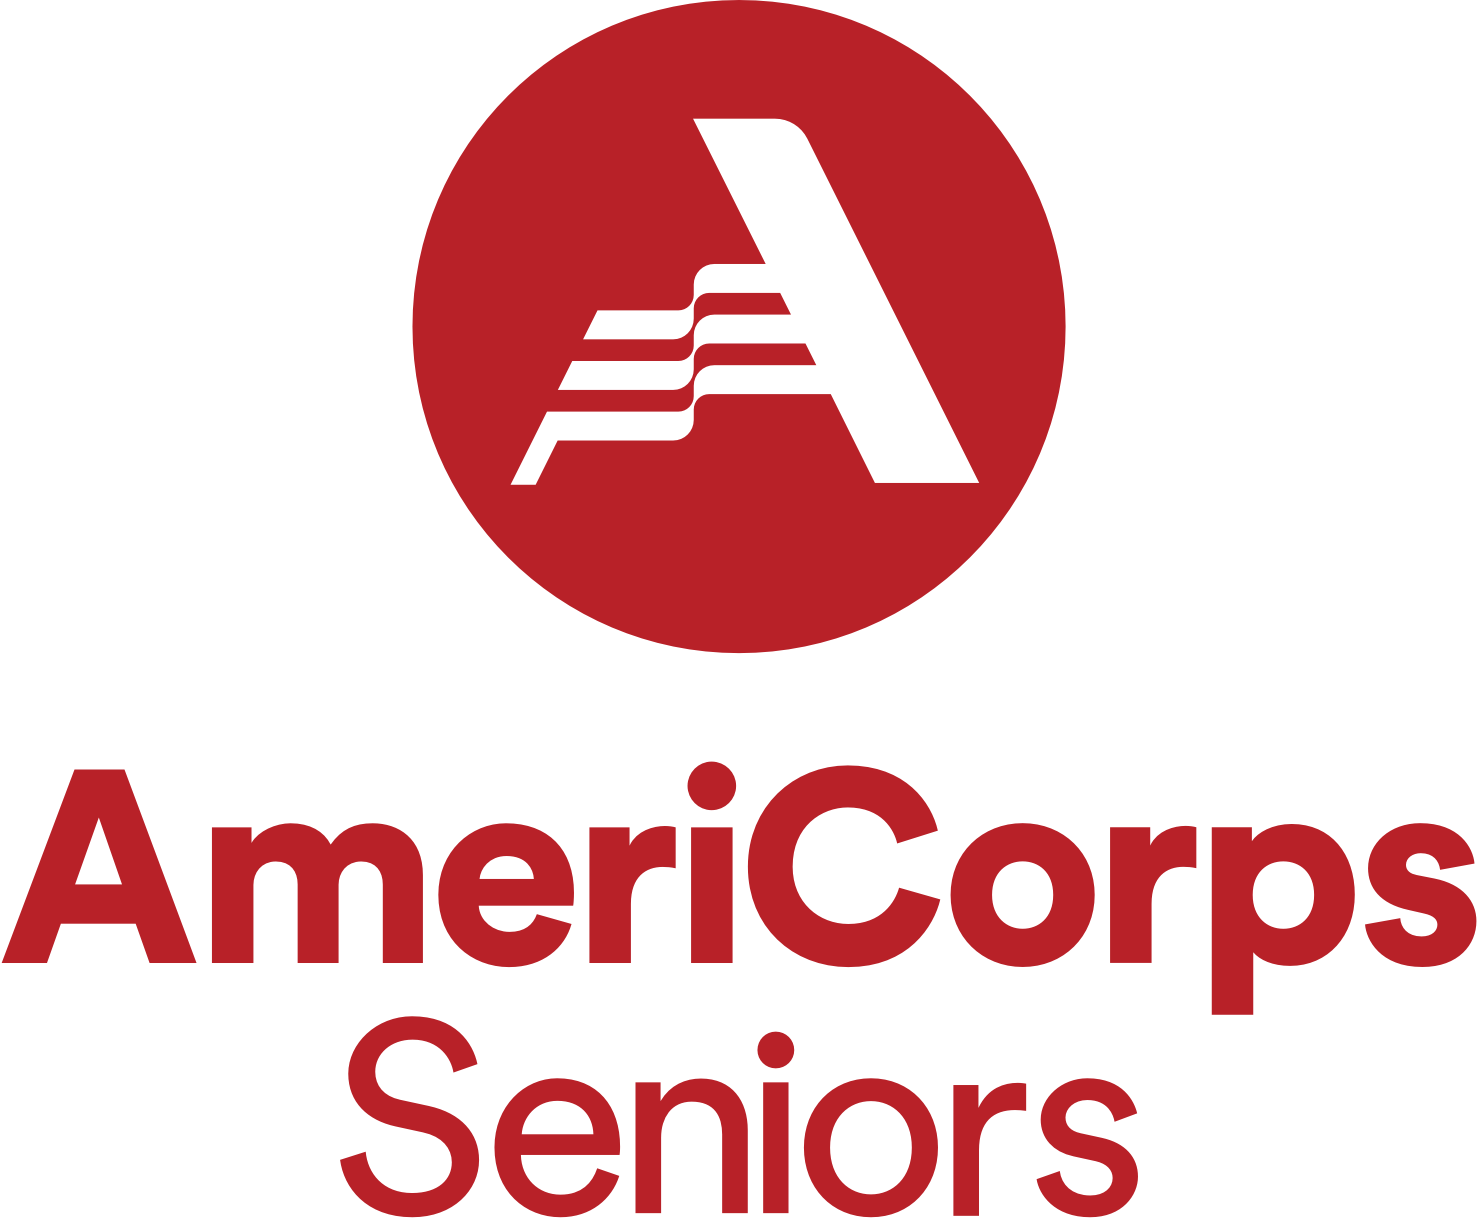 AmeriCorps Seniors - Senior Companions